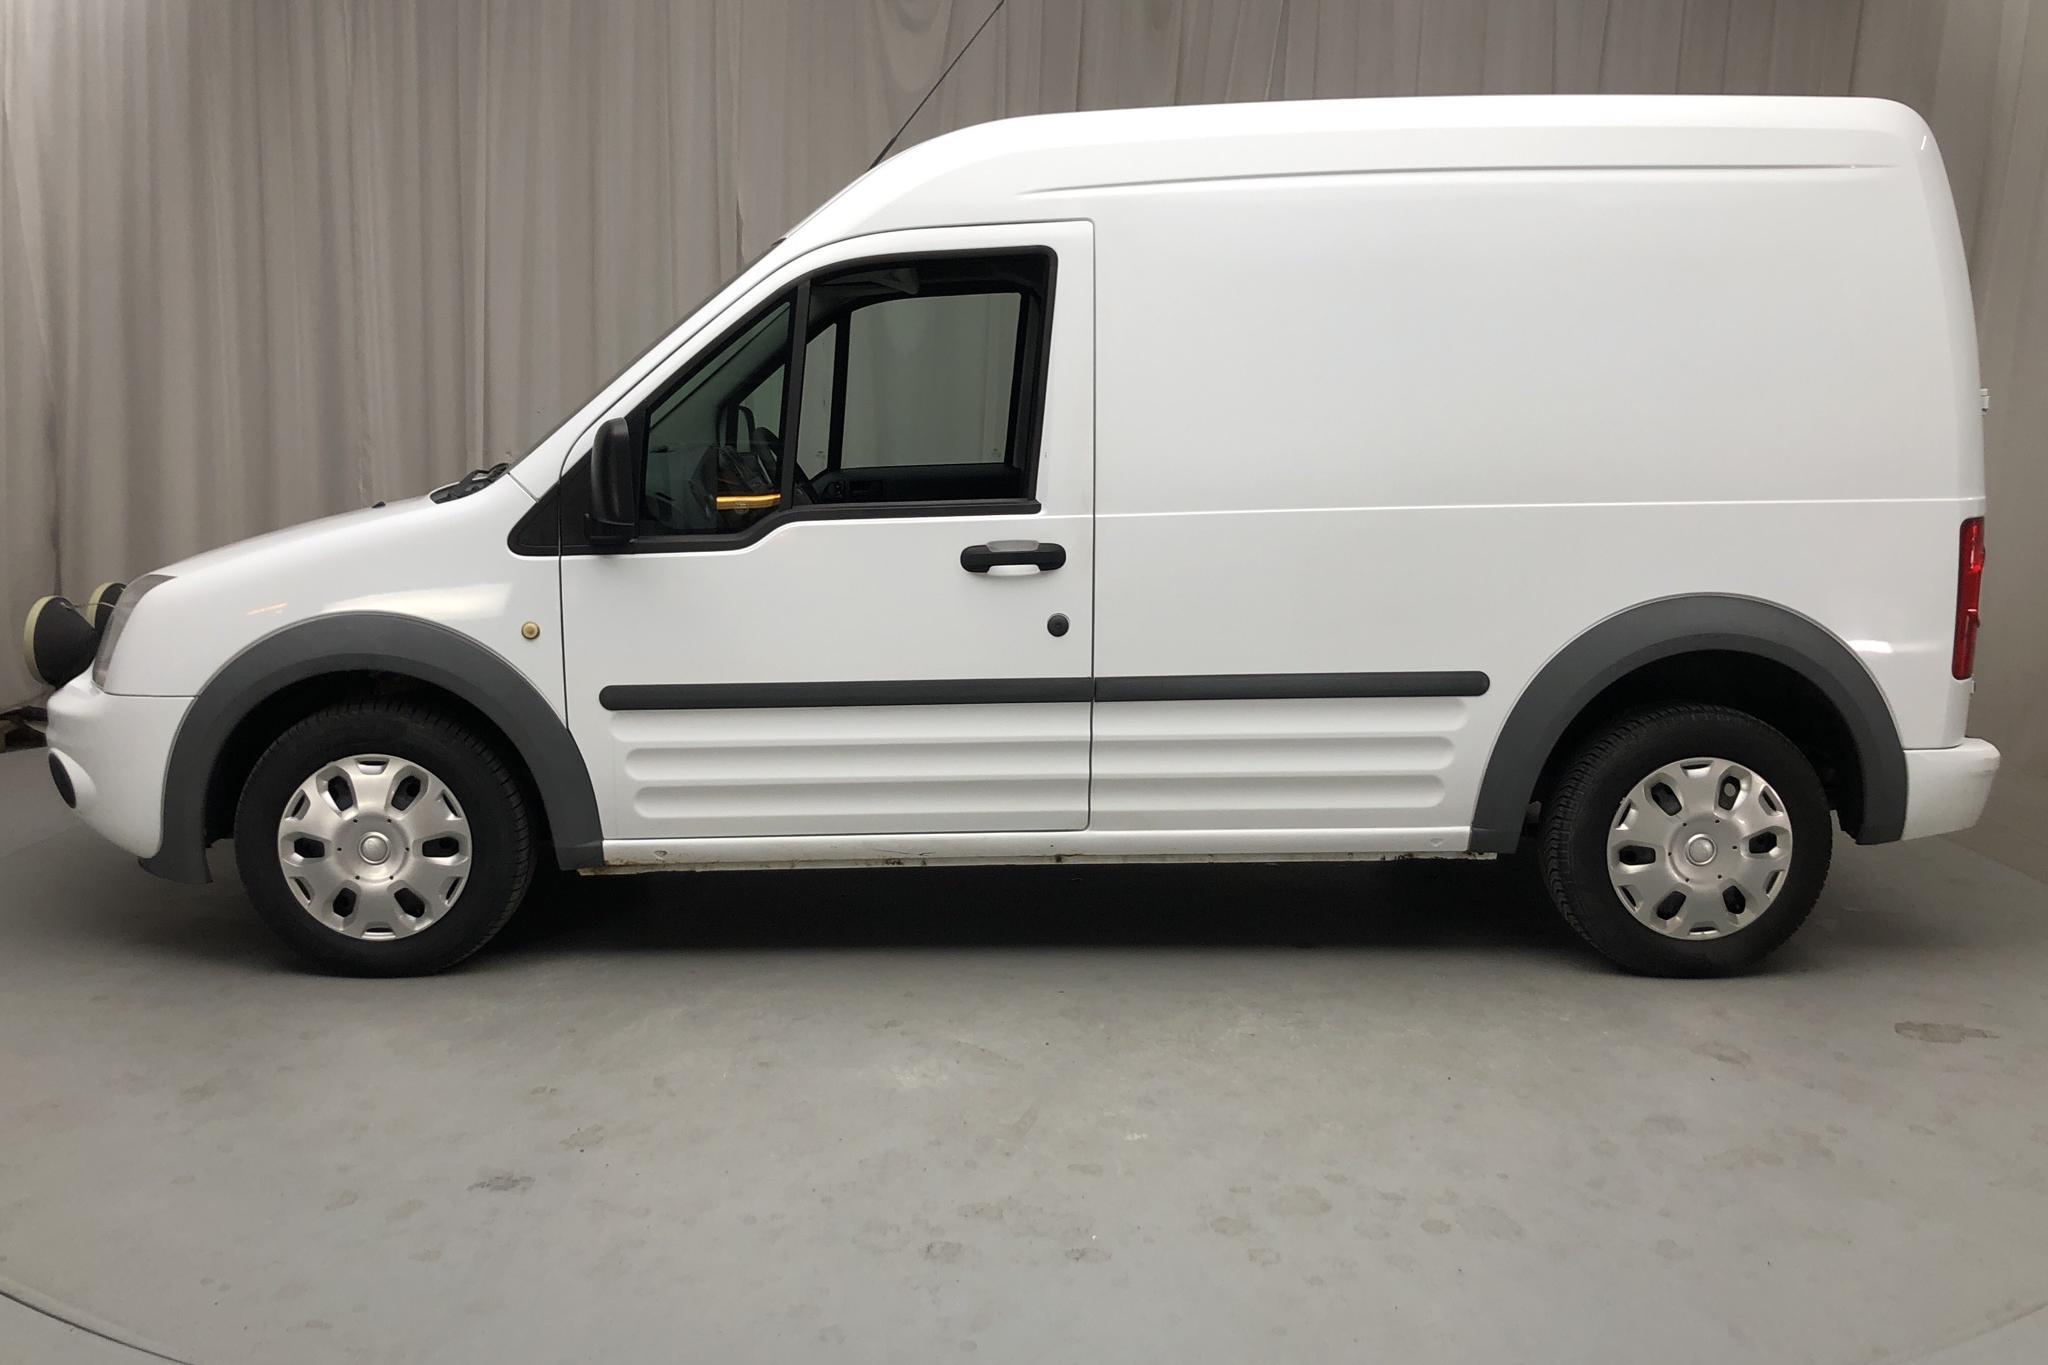 Ford Transit Connect 1.8 TDCi (110hk) - 9 325 mil - Manuell - vit - 2011